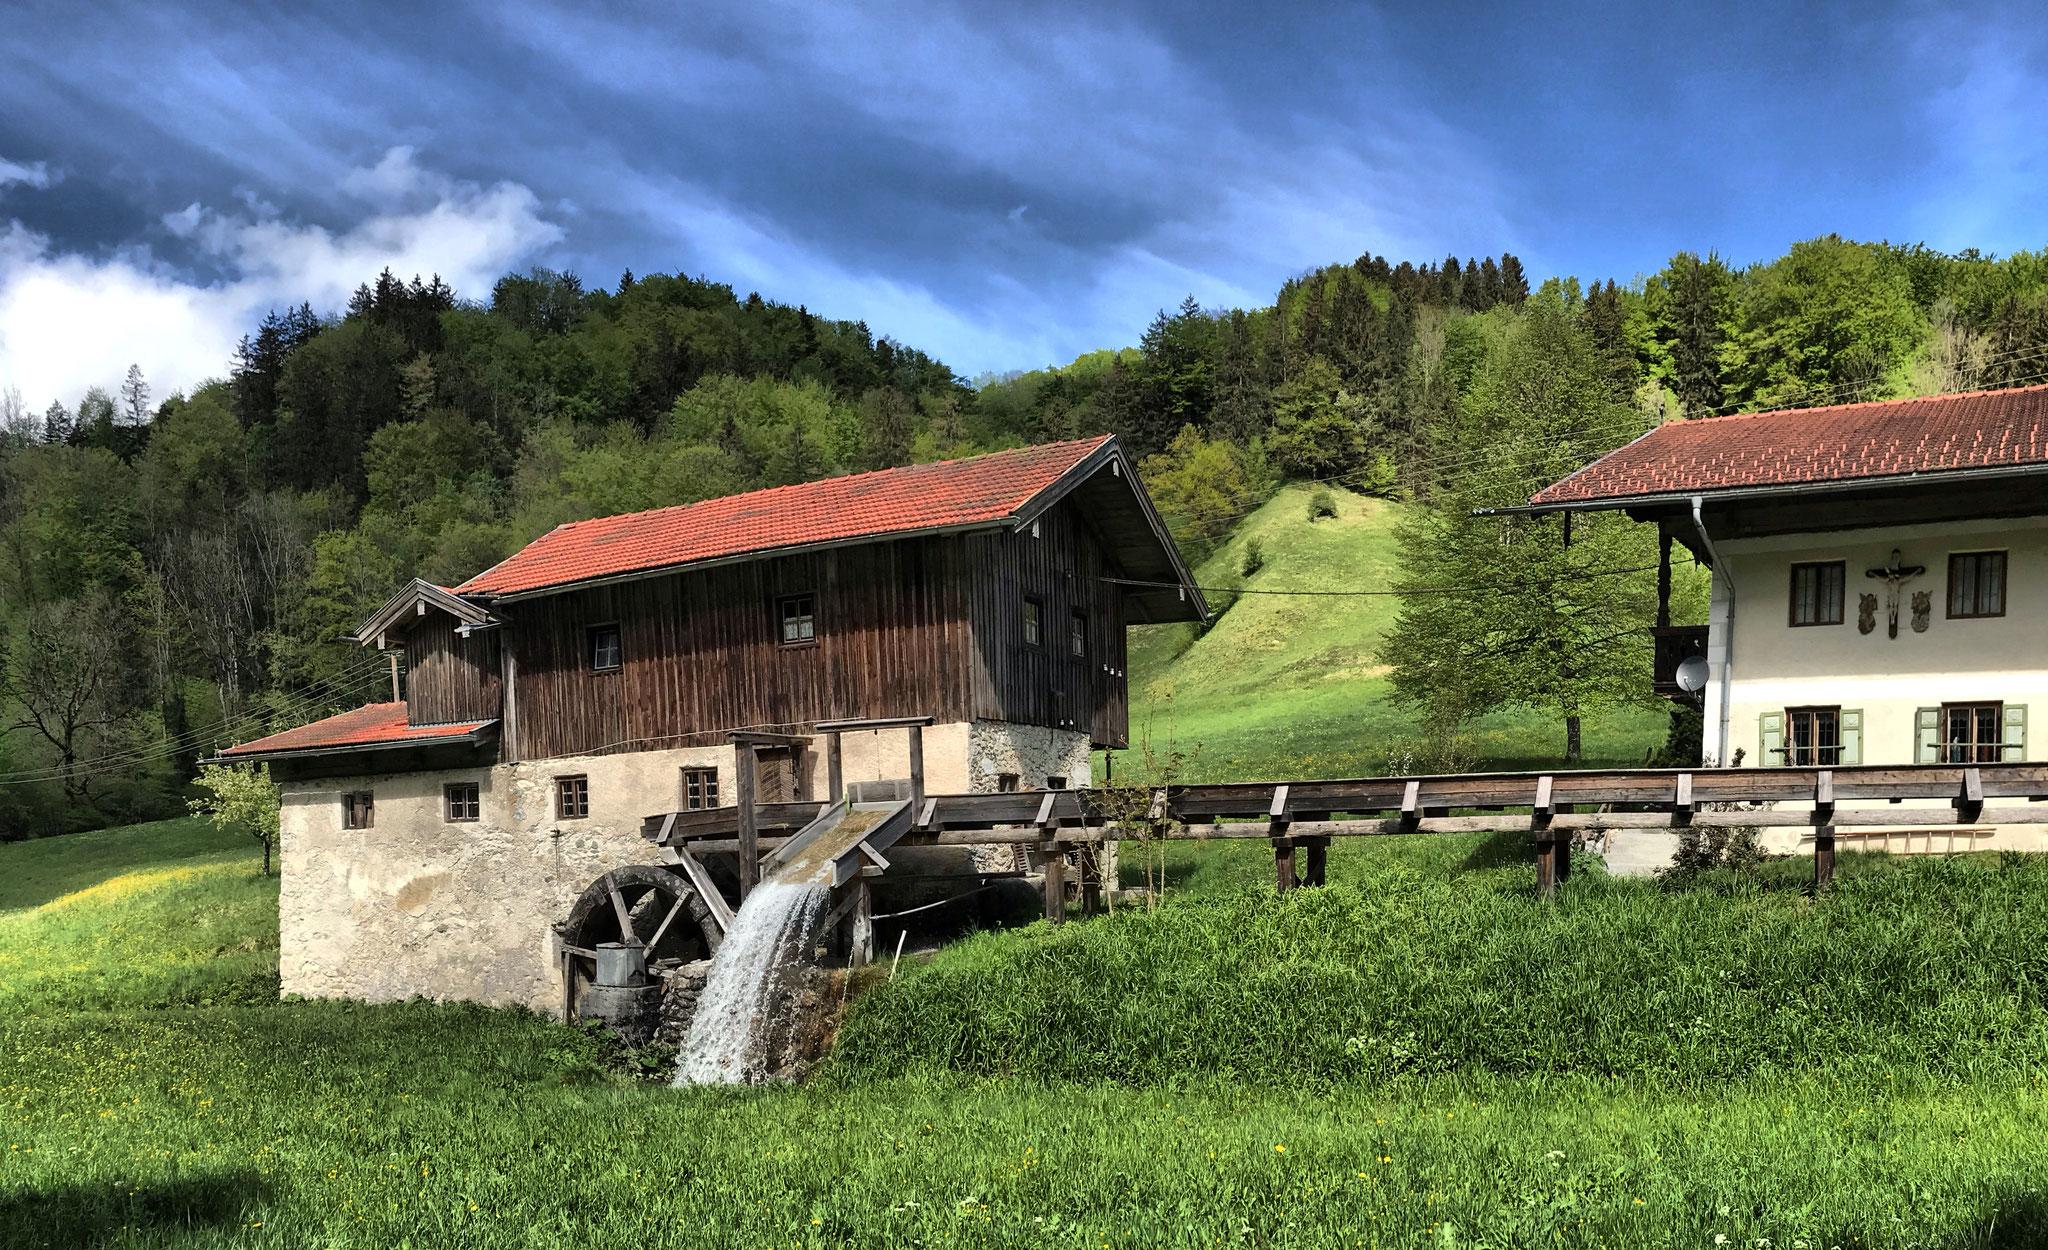 Etappe O05: Nußdorf - Törwang